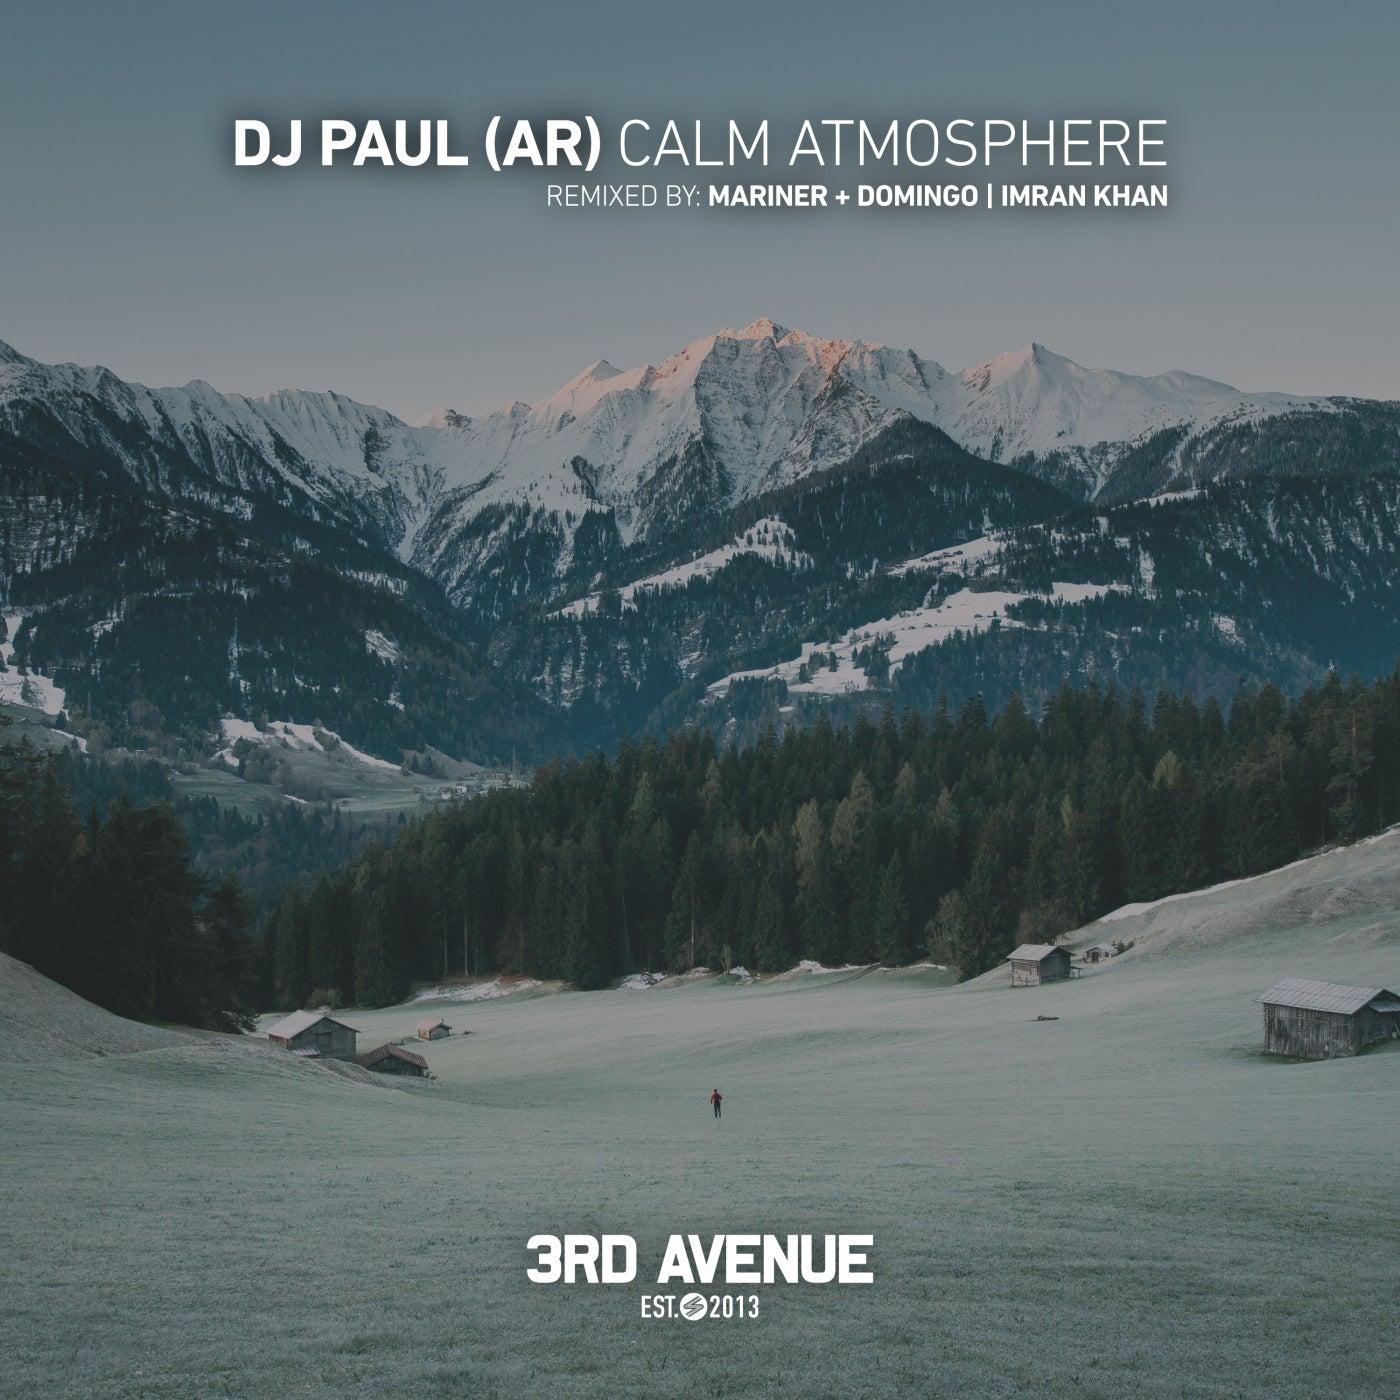 Calm Atmosphere (Imran Khan's Nod to 90's Remix)